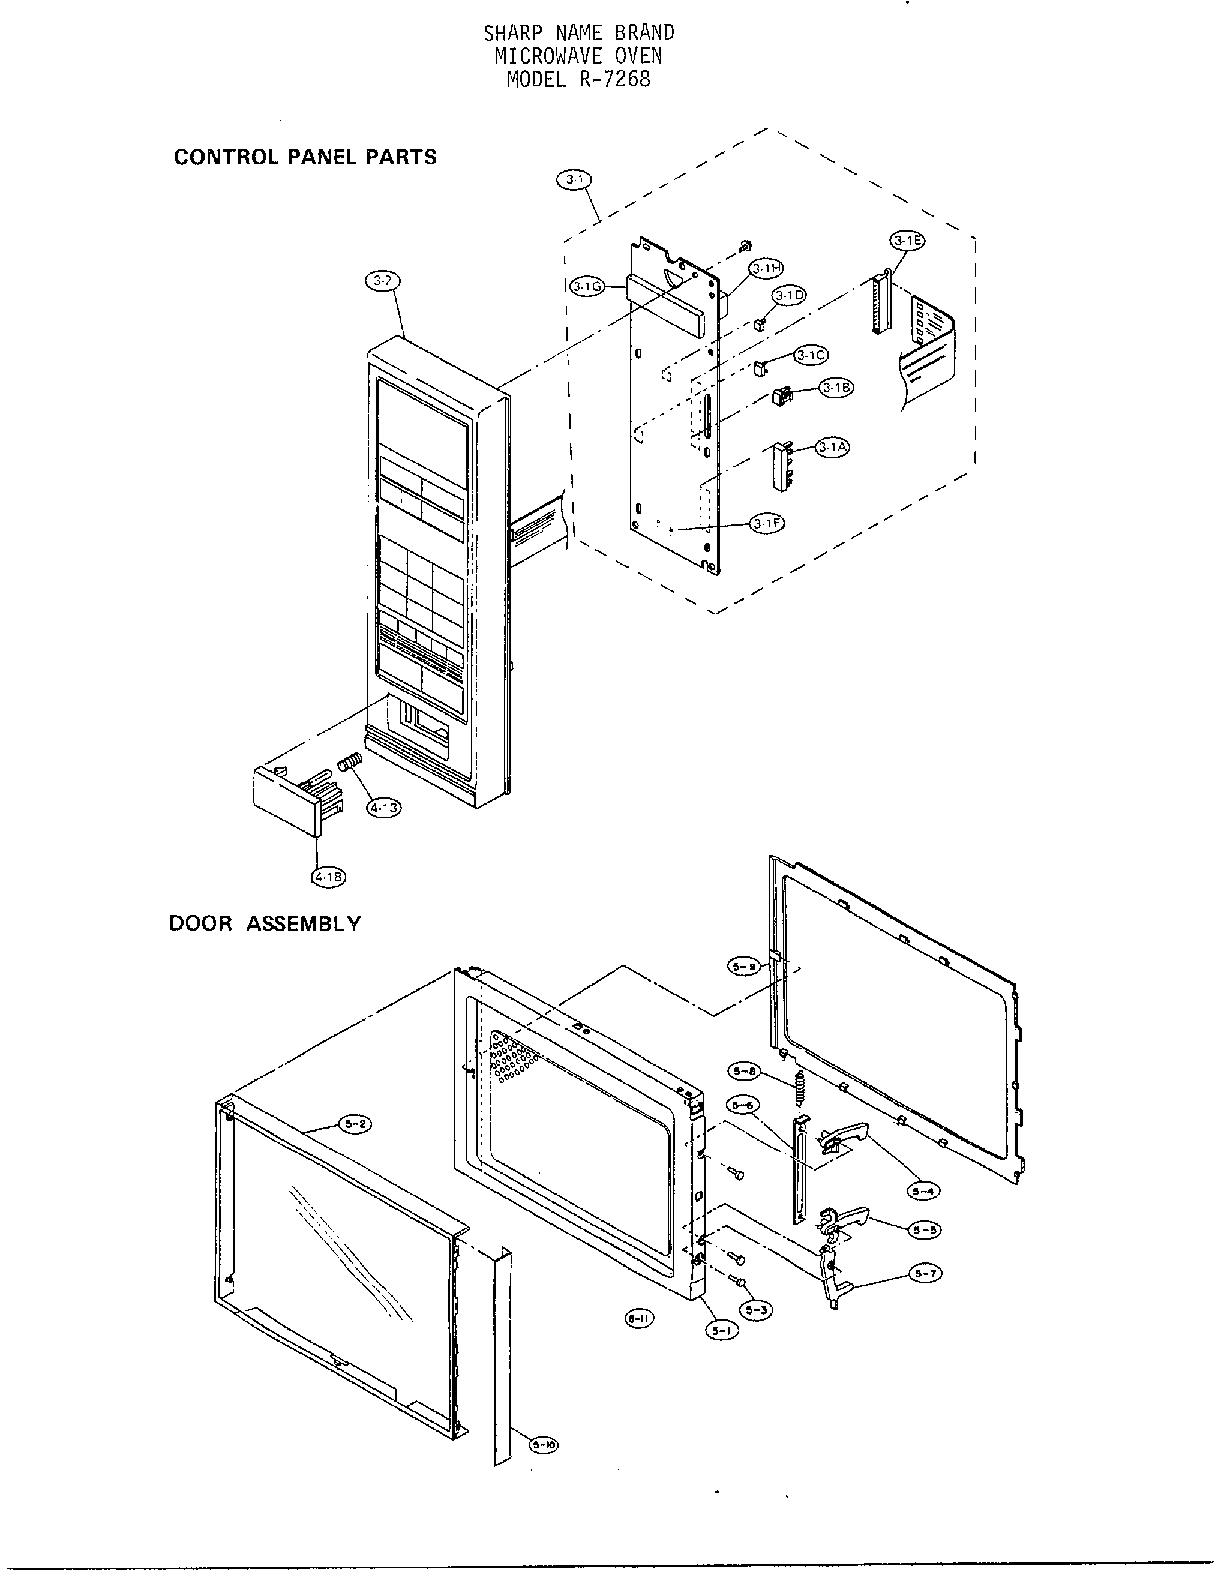 16 Craftsman Chainsaw Fuel Line Diagram Chevy Fuel Line